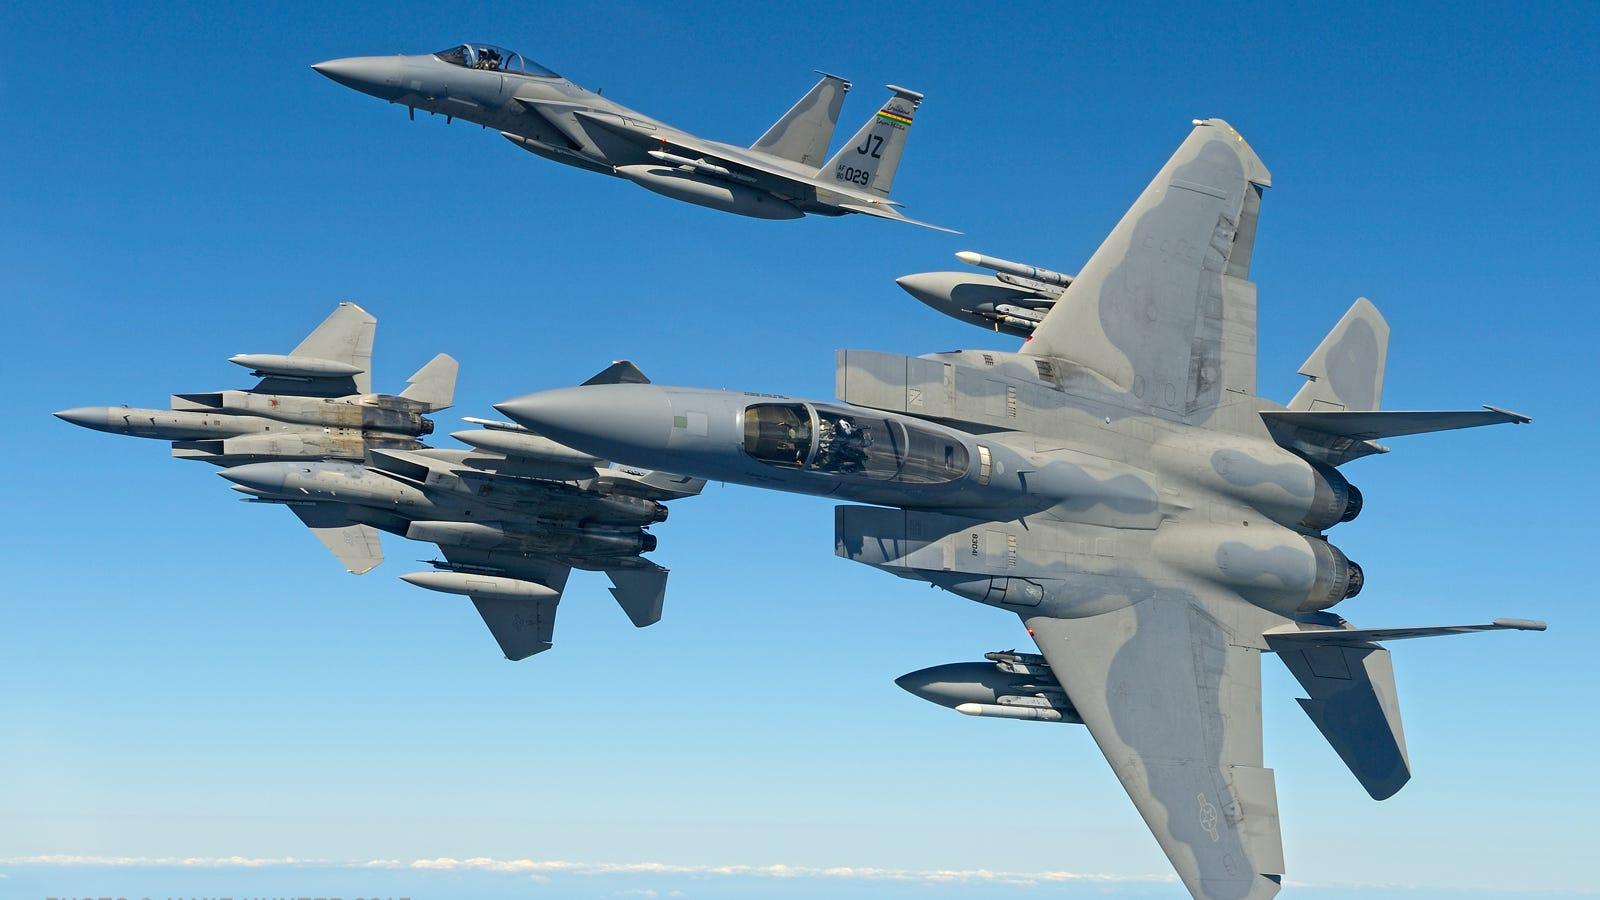 These Air-To-Air Shots Of The Bayou Militia's F-15 Eagles